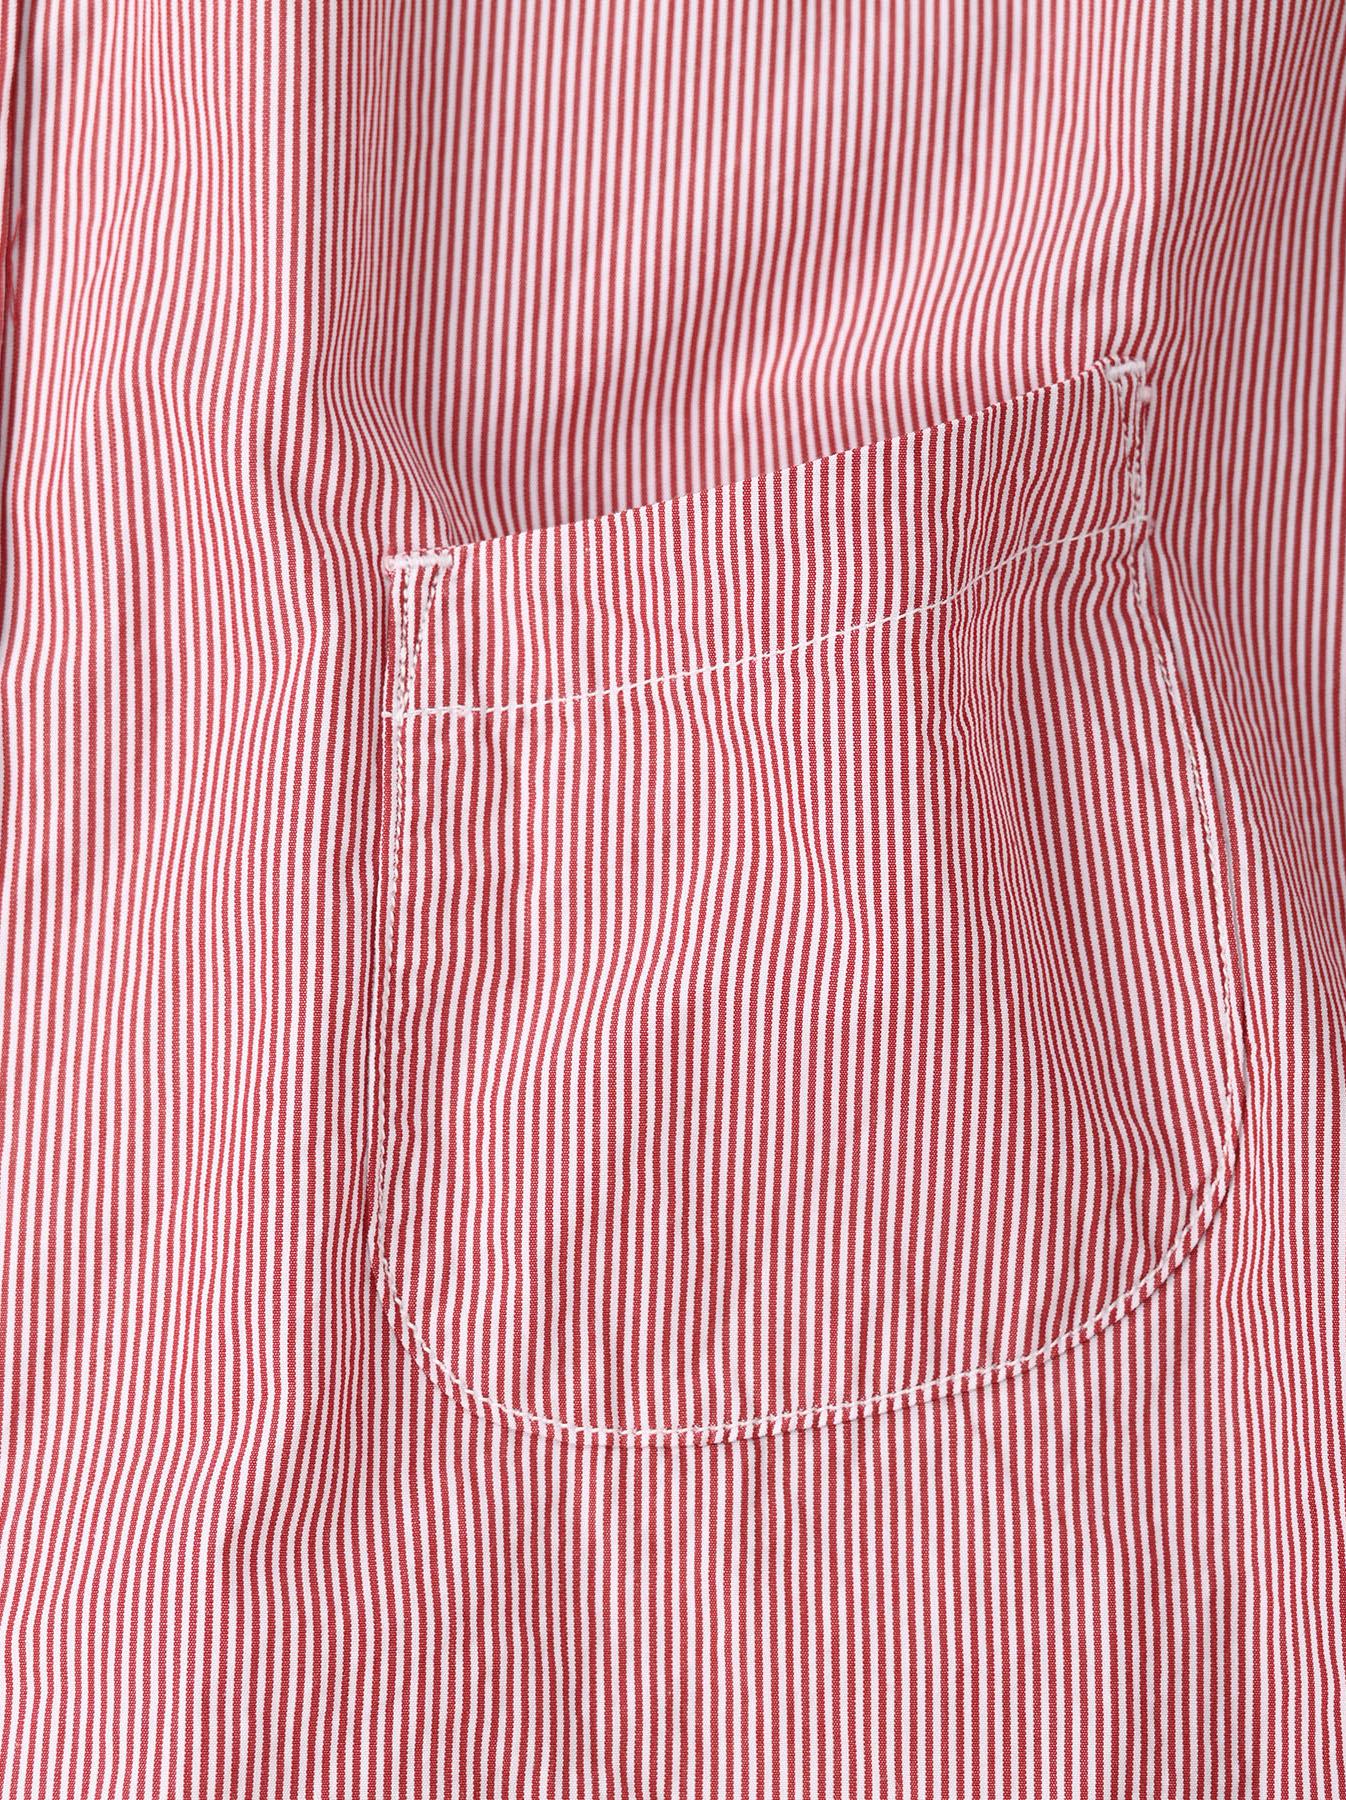 Miko Stand Collar 908 Ocean Shirt-10